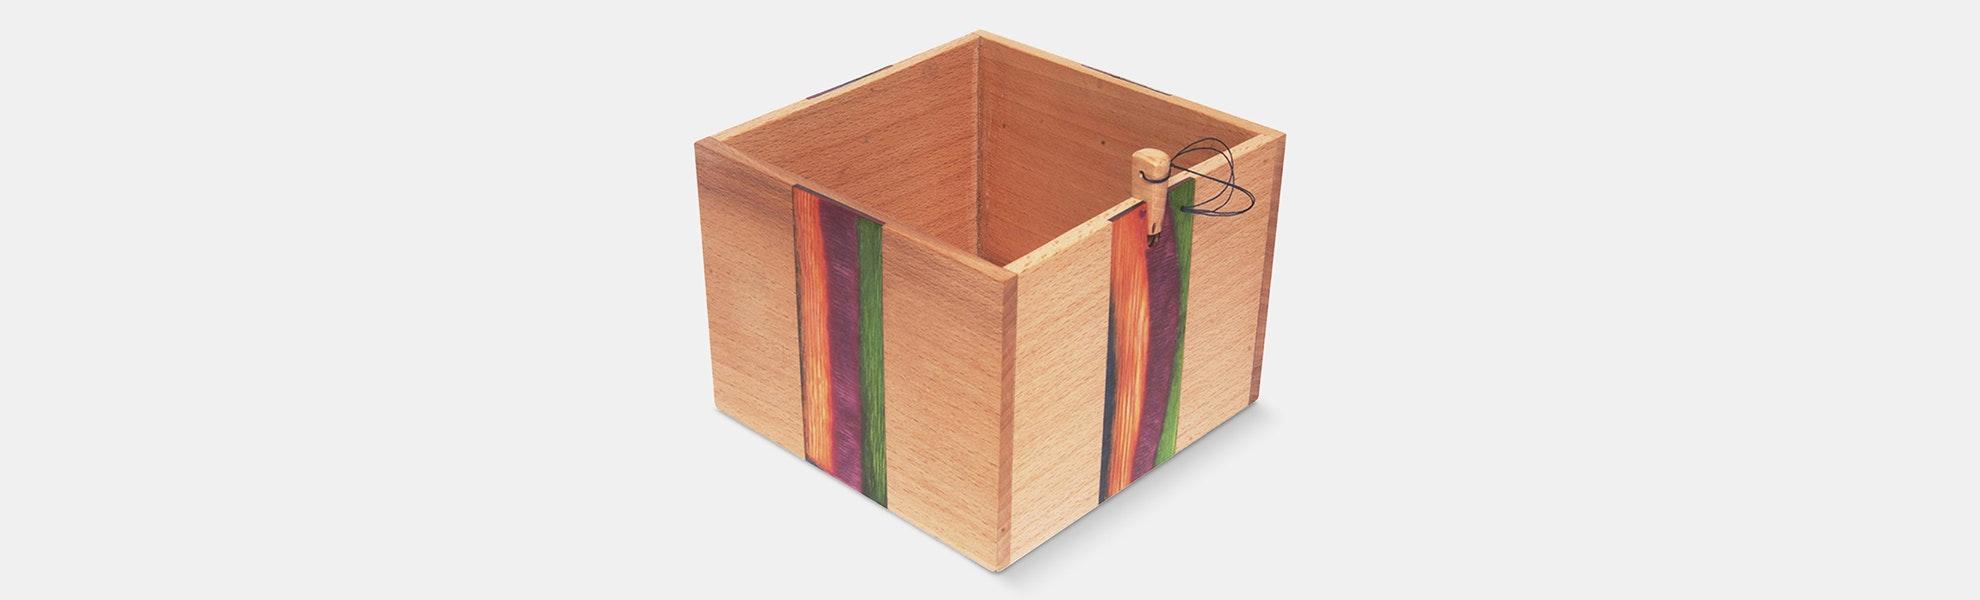 Wooden Yarn Box (Preorder)